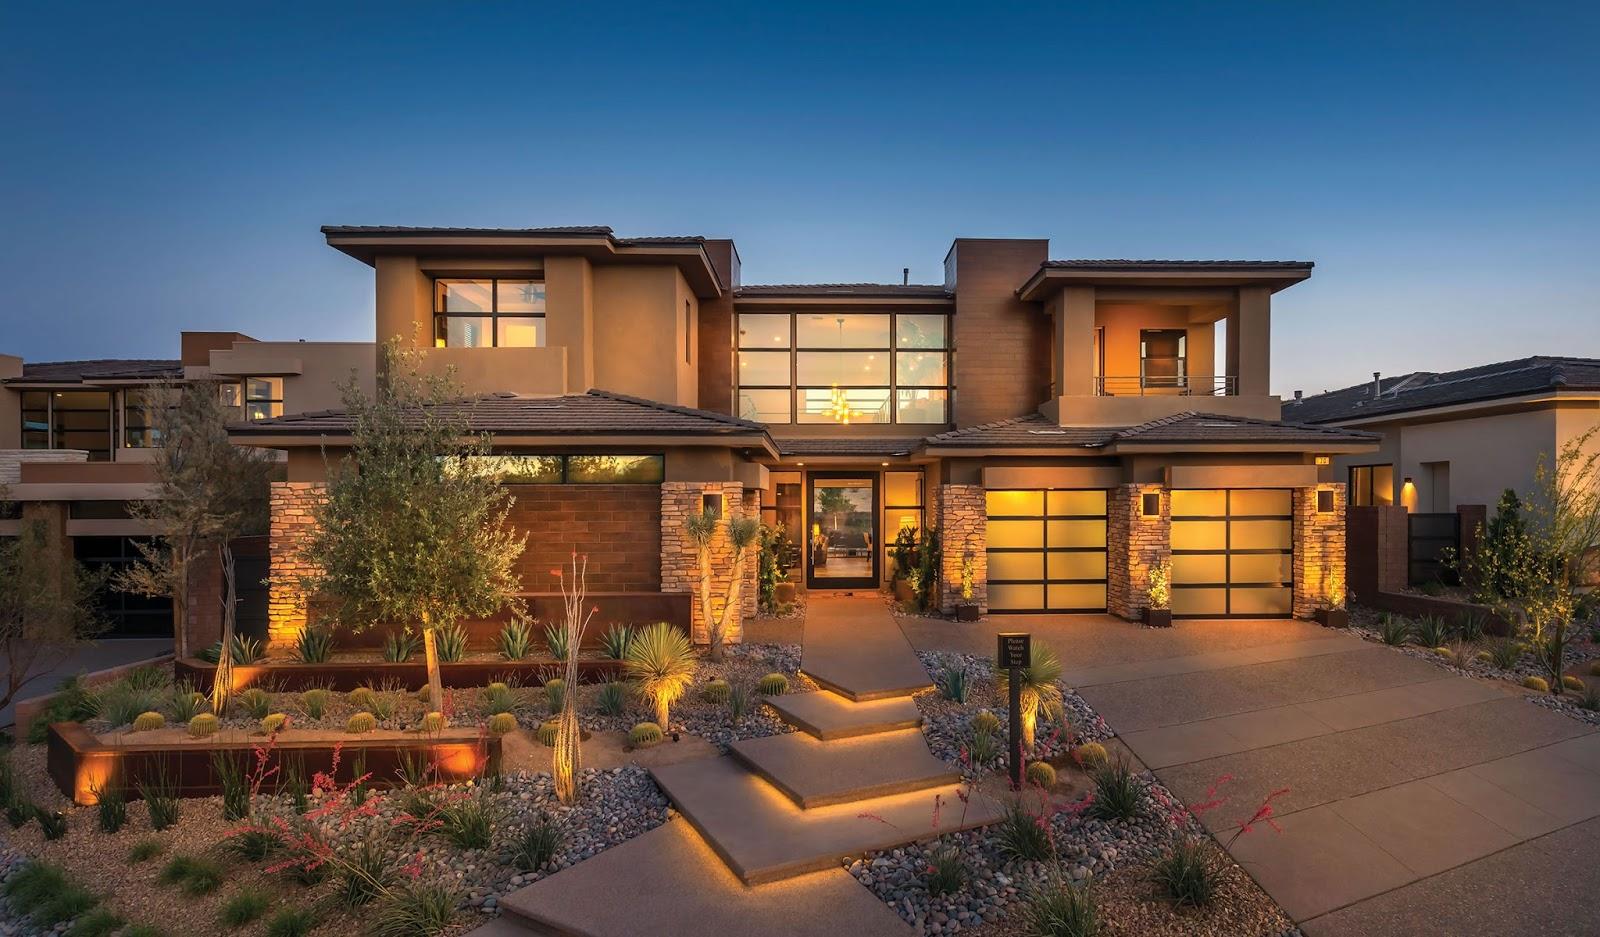 Lake Las Vegas New Construction Homes For Sale